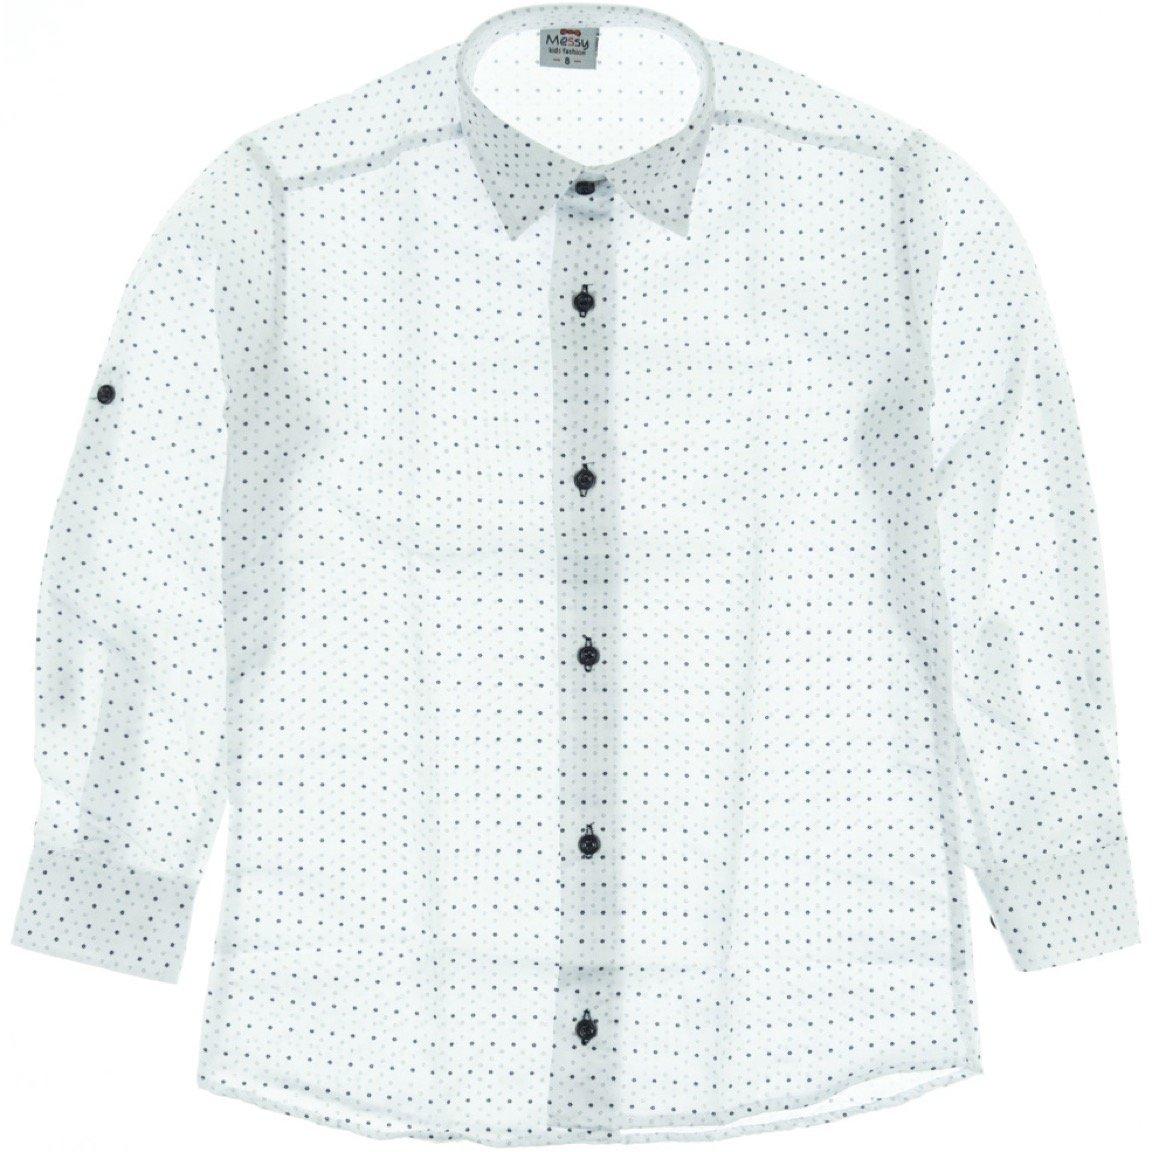 Messy παιδικό πουκάμισο «Mister Genius»